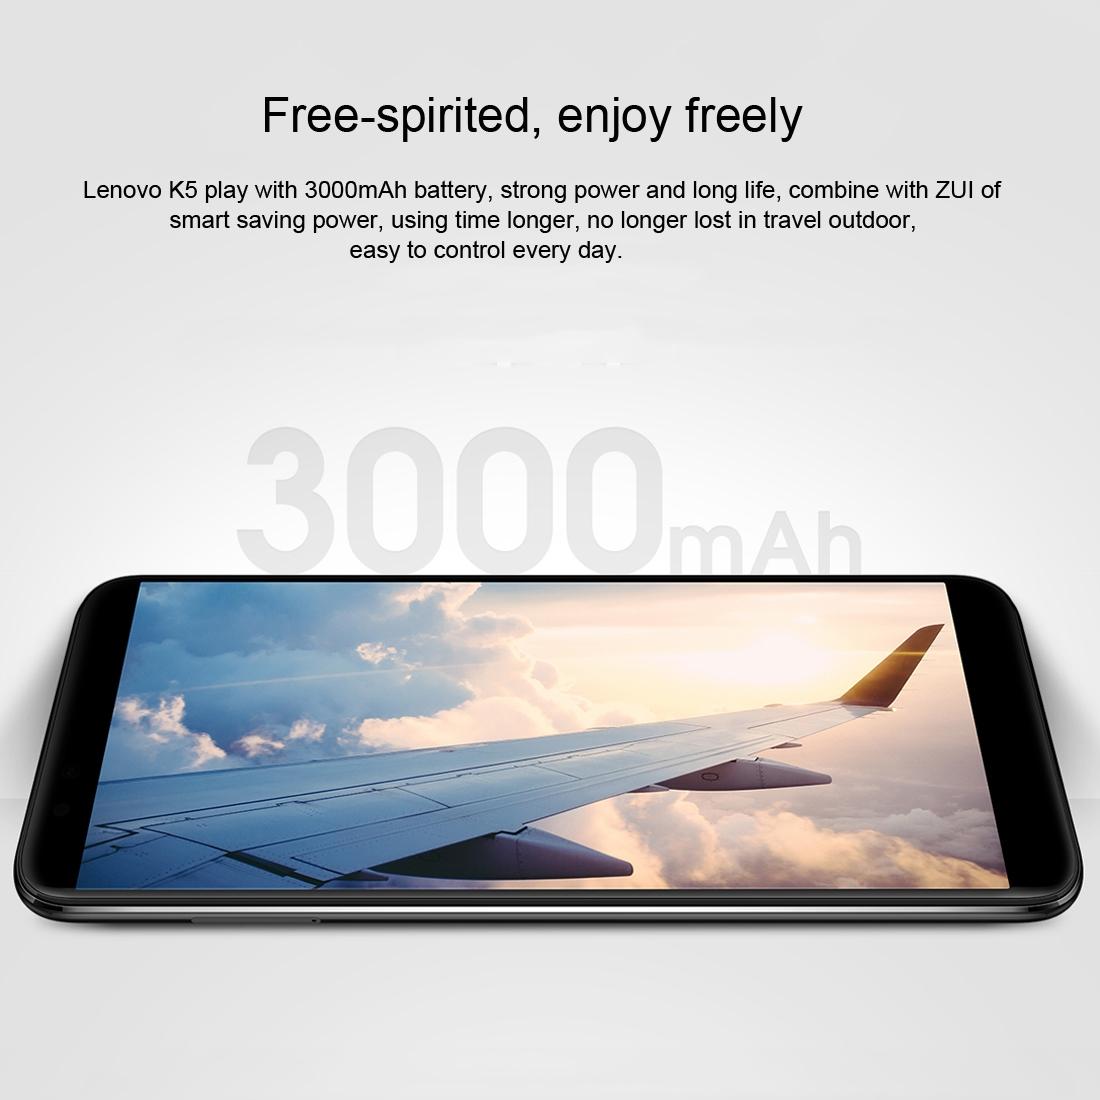 i.ibb.co/LY8cZmN/Smartphone-3-GB-32-GB-Jogo-Lenovo-K5-Play-Azul-11.jpg